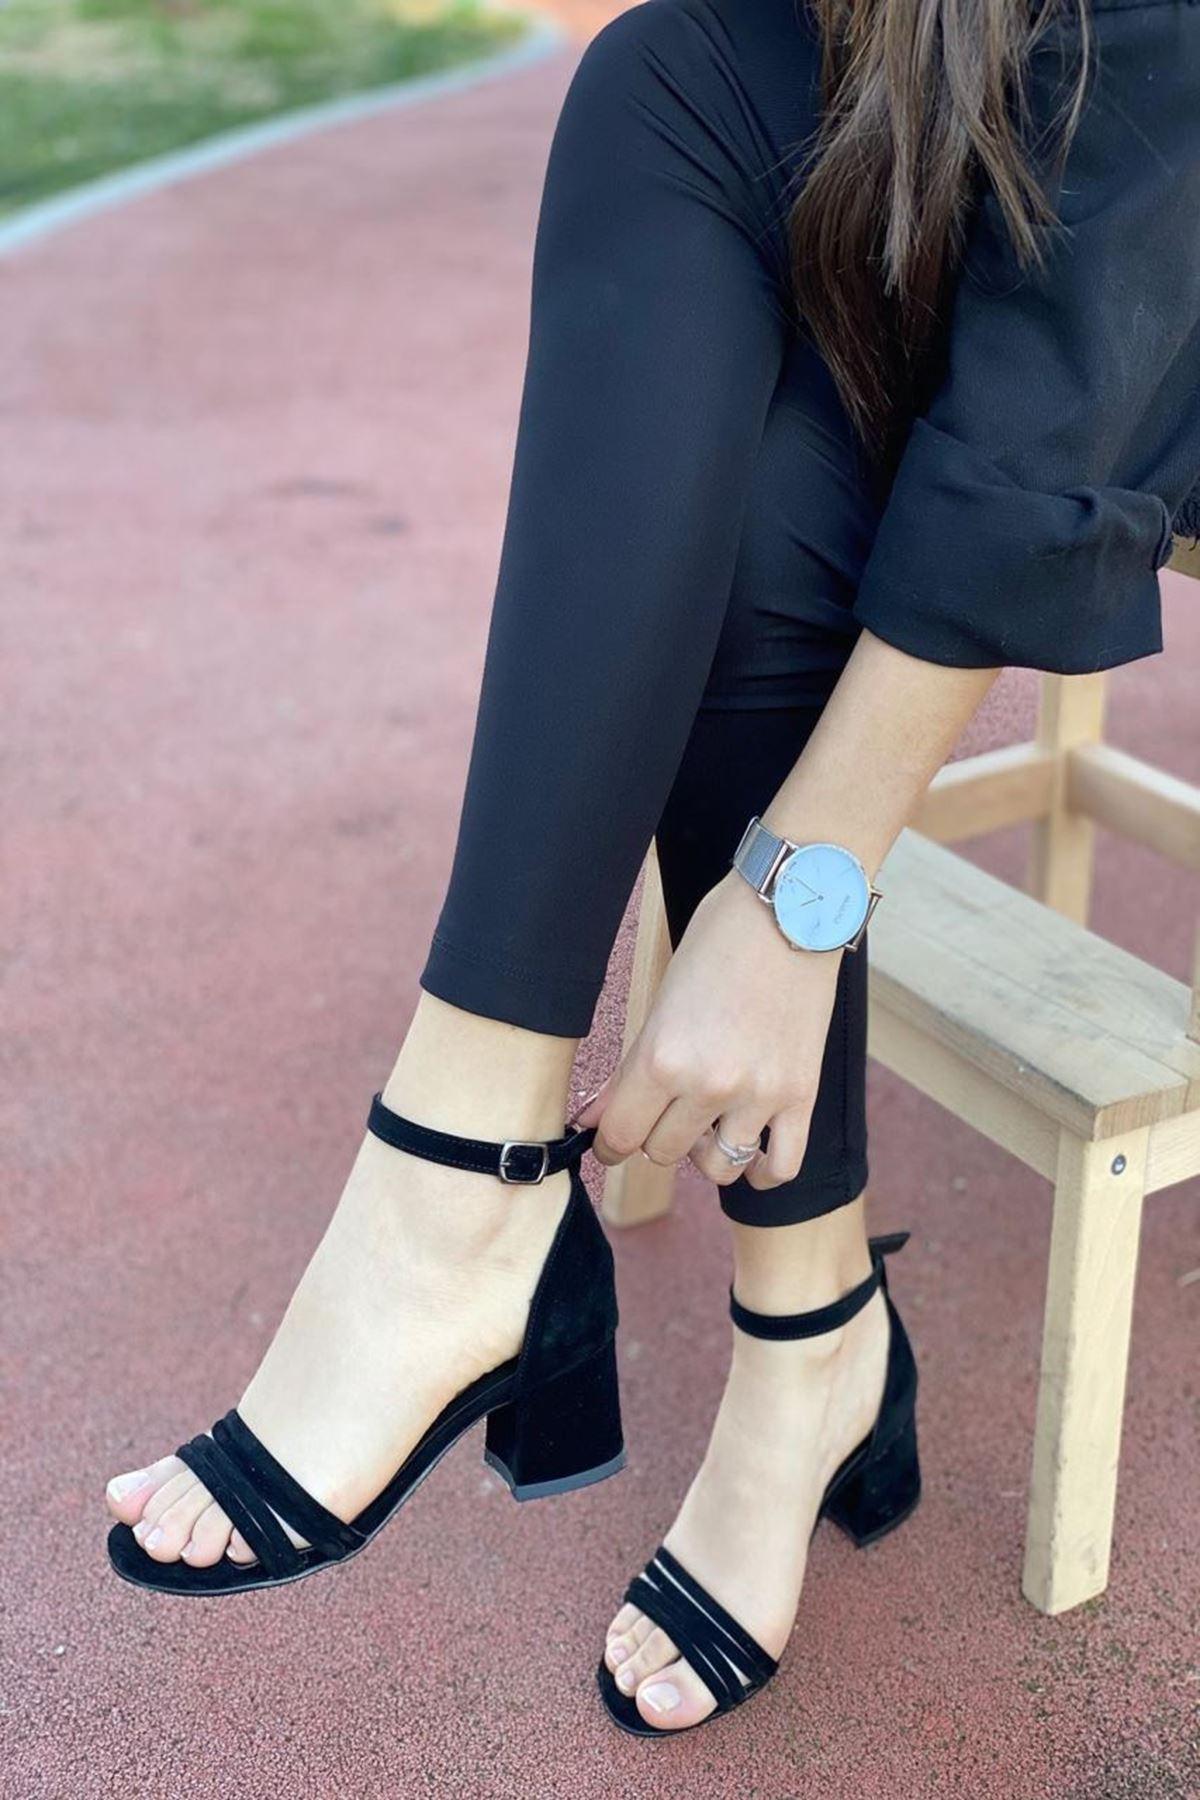 Kadın Natin Süet Siyah Hafif Topuklu Ayakkabı